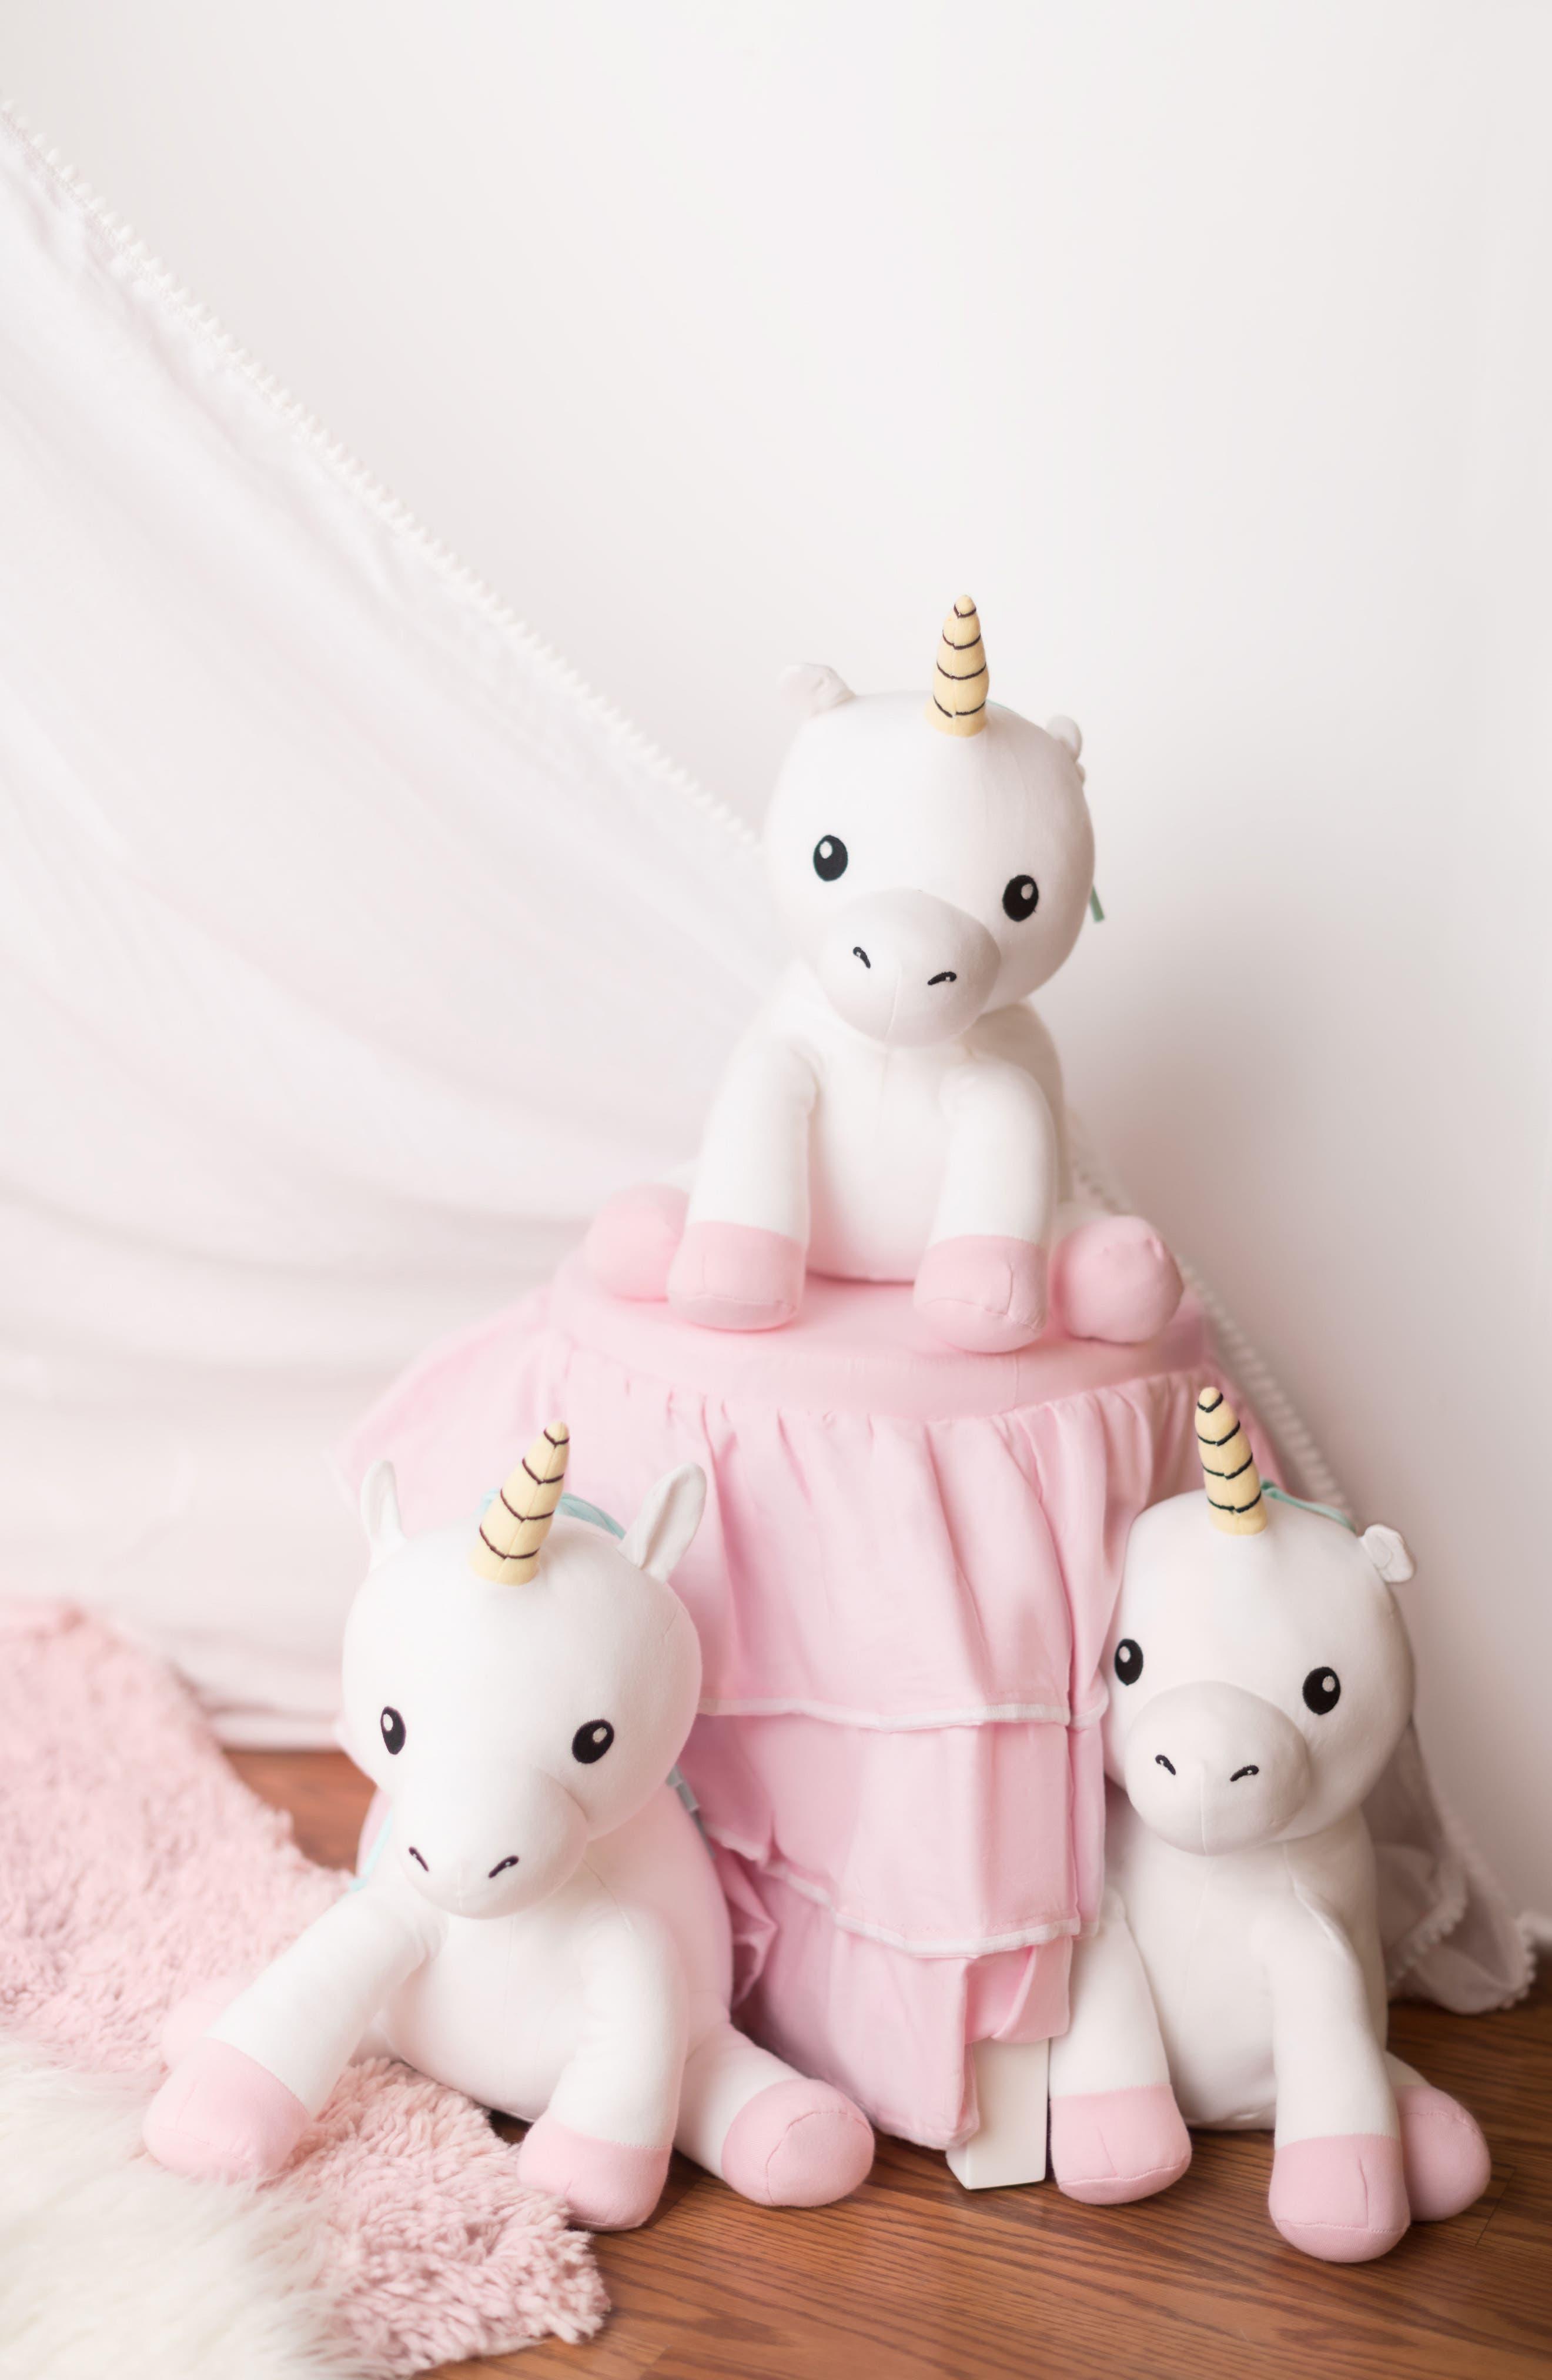 Cupcake Unicorn Stuffed Animal,                             Alternate thumbnail 7, color,                             100